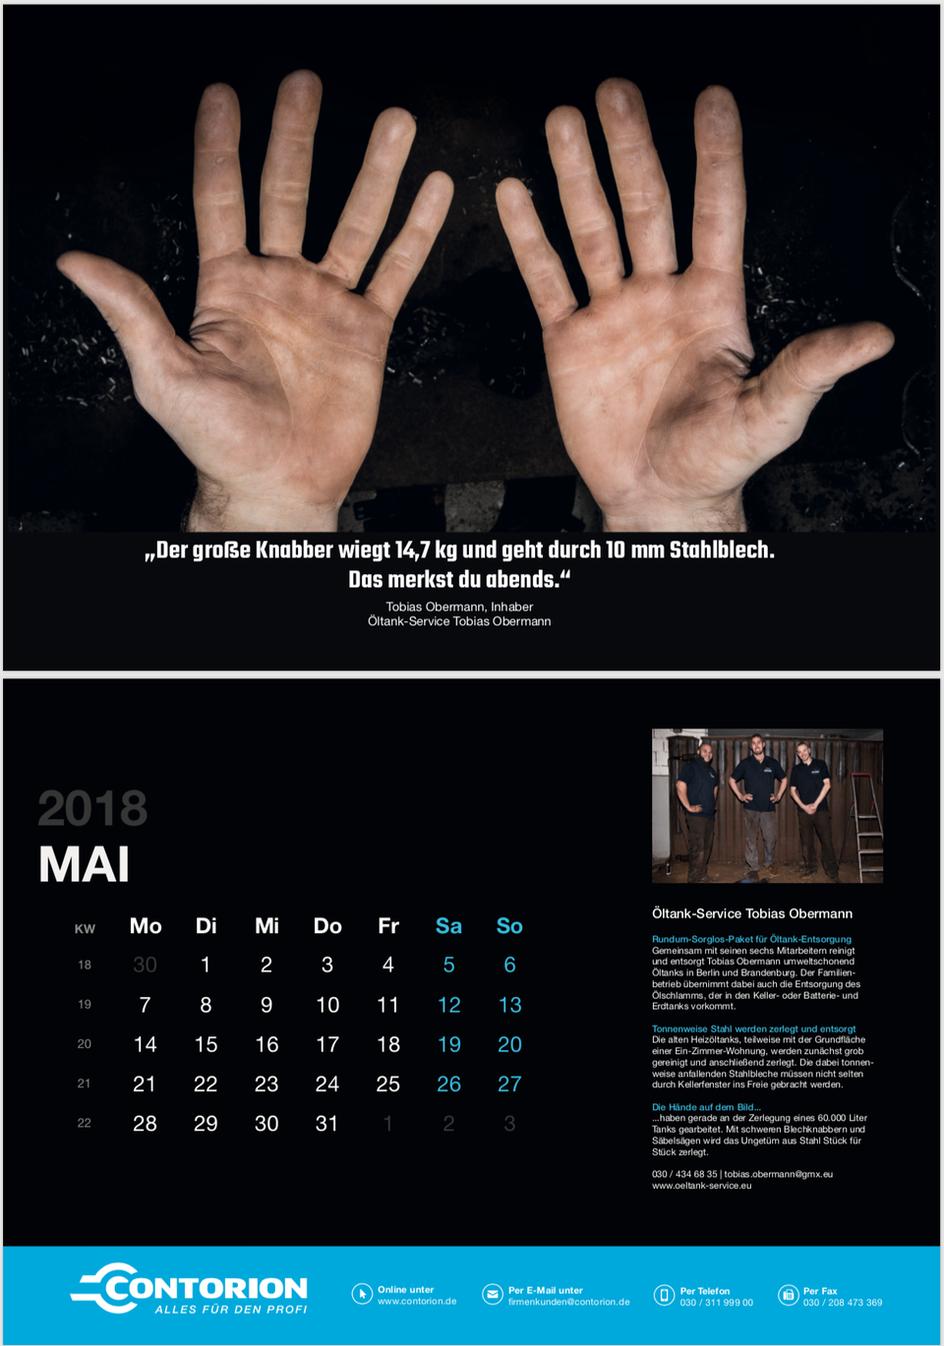 Öltankentsorgung Klaus Obermann Kalender 2018